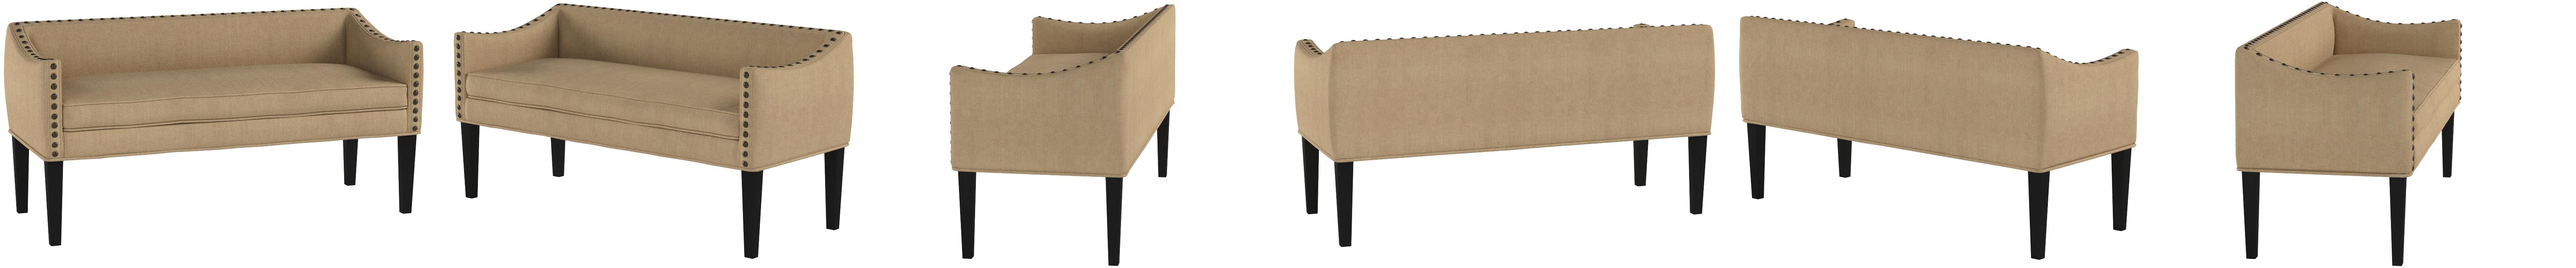 Amazon Com Leffler Home Whitney Transitional Long Upholstered Bench Chestnut Brown Furniture Decor